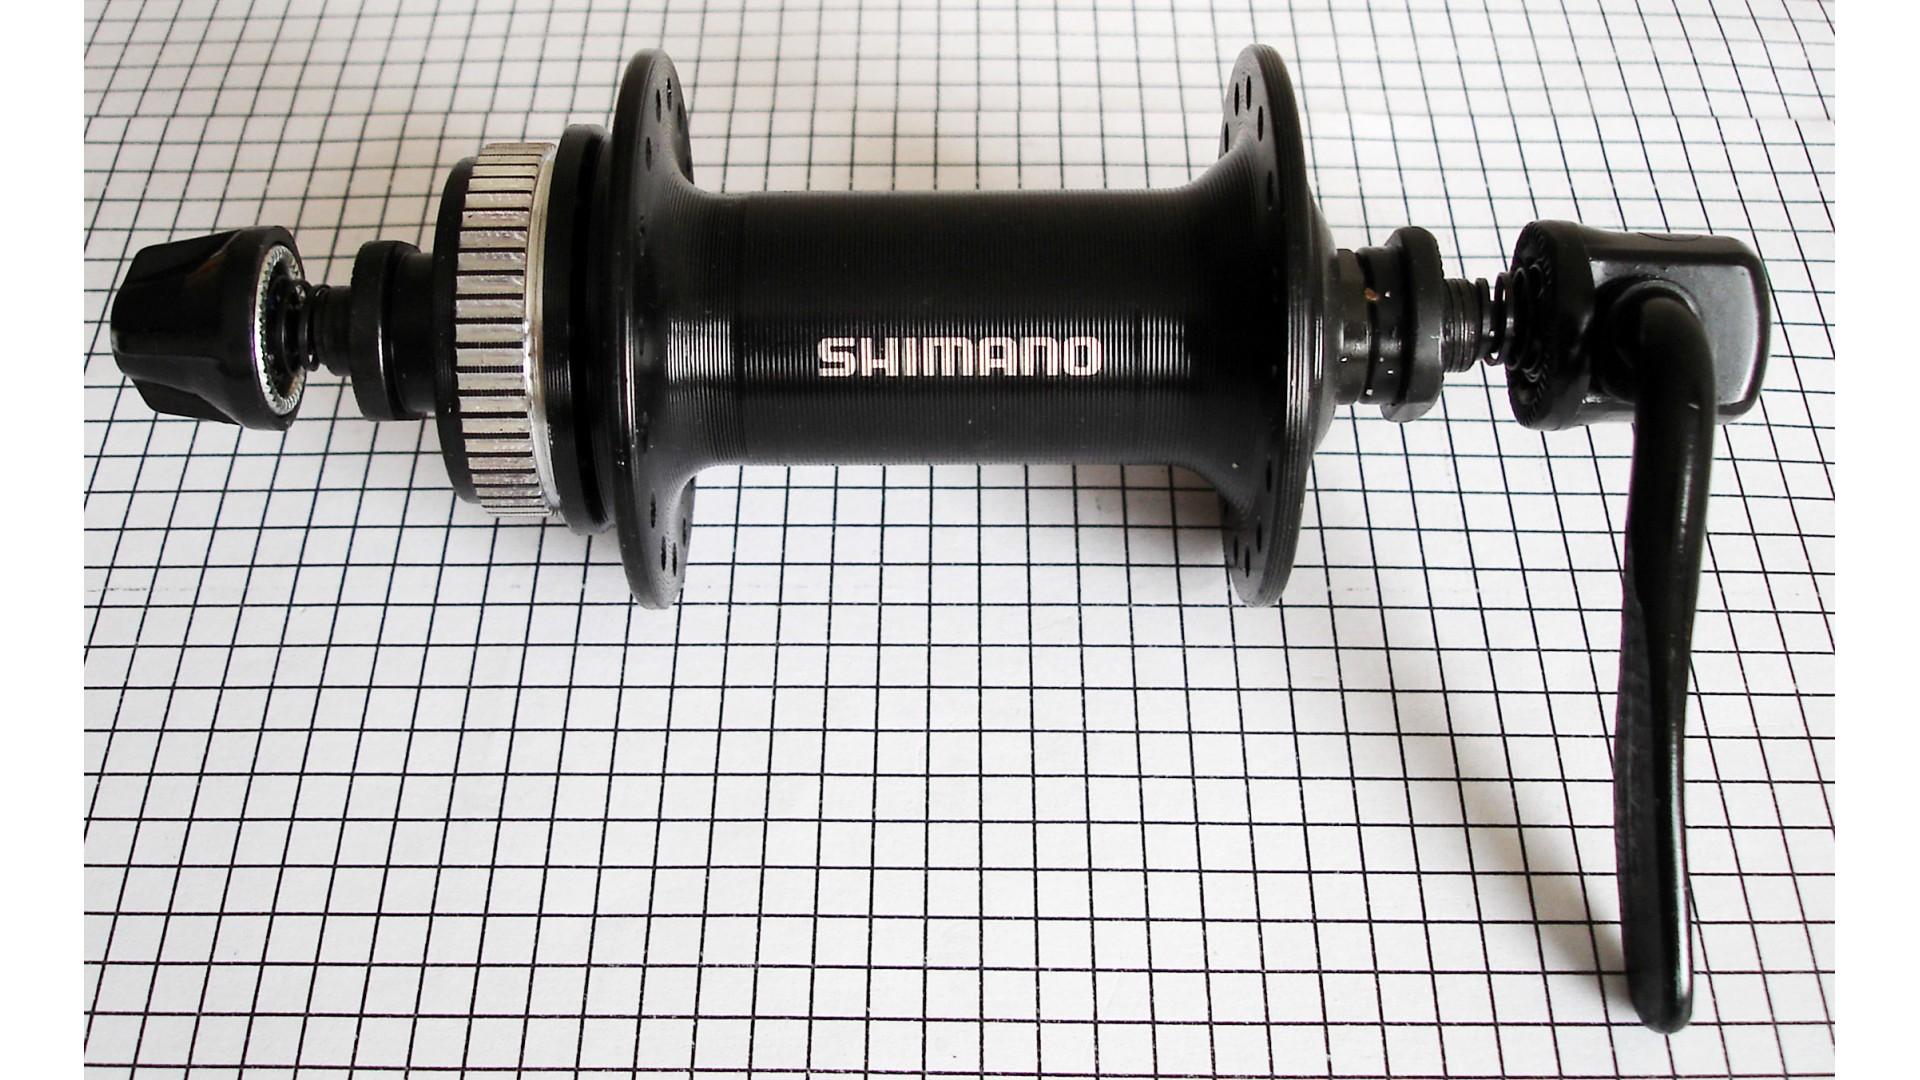 Втулка передняя Shimano HB-TX505 на CenterLock, 32 отв. черная